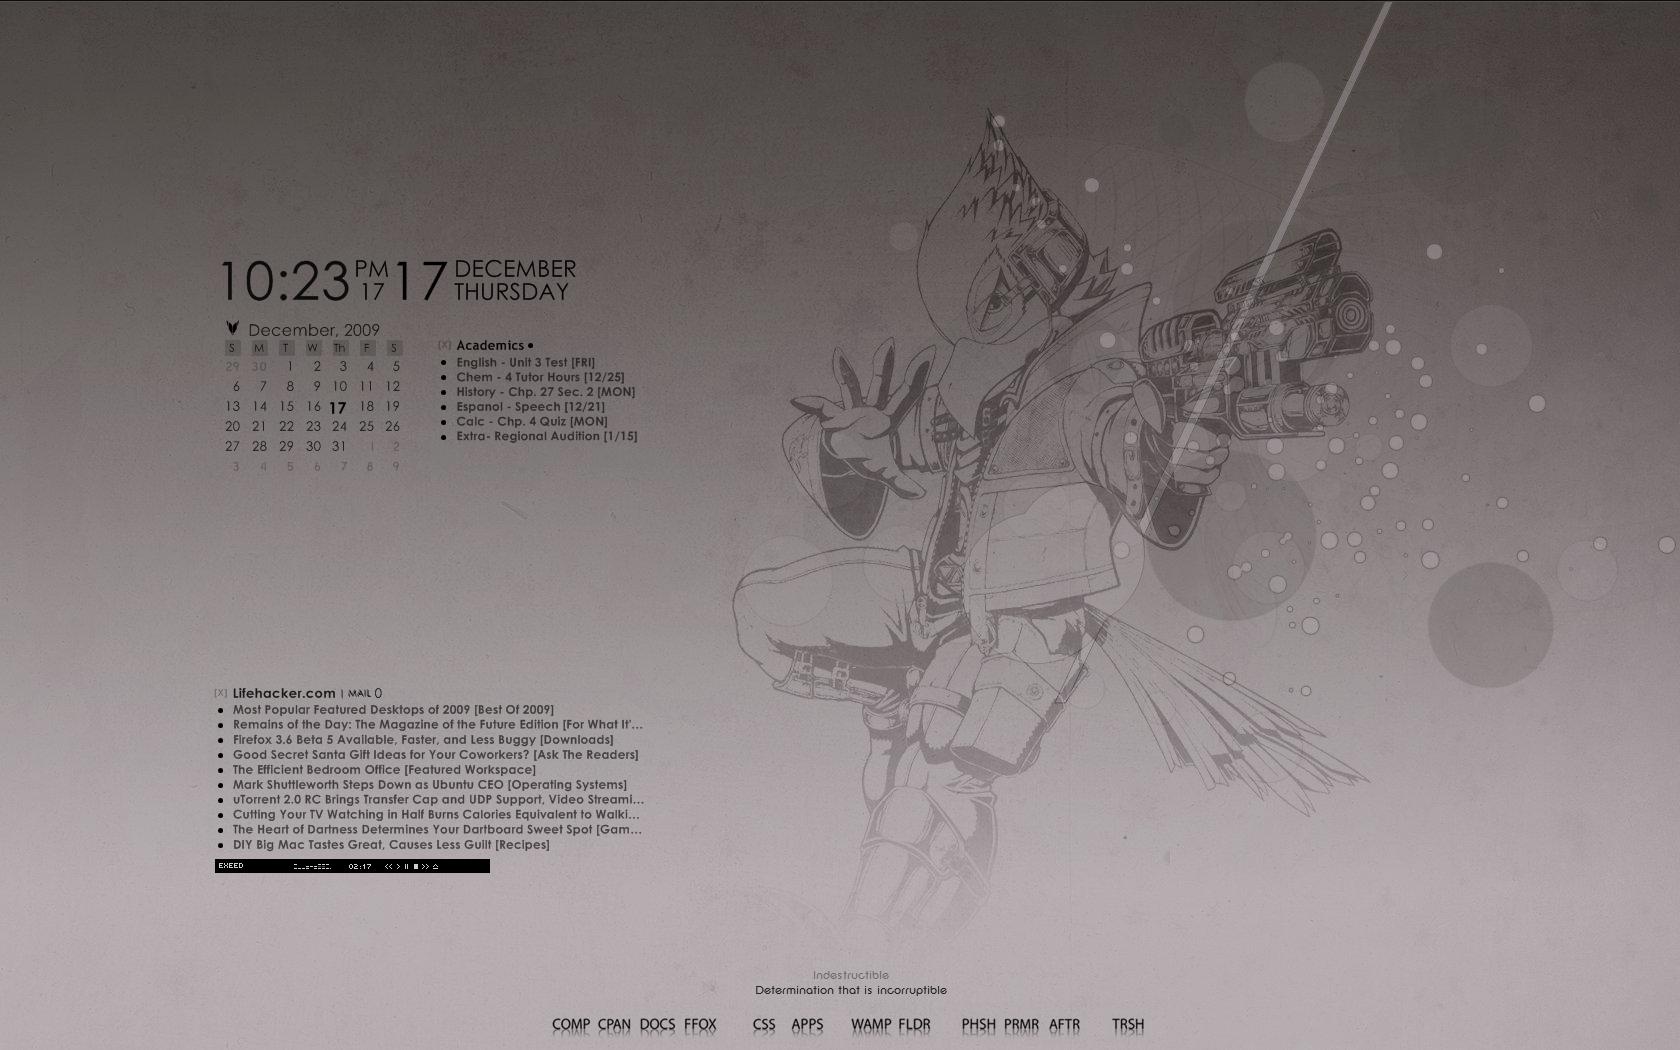 Desktop_12_17_09_by_chA1nBull3t.png